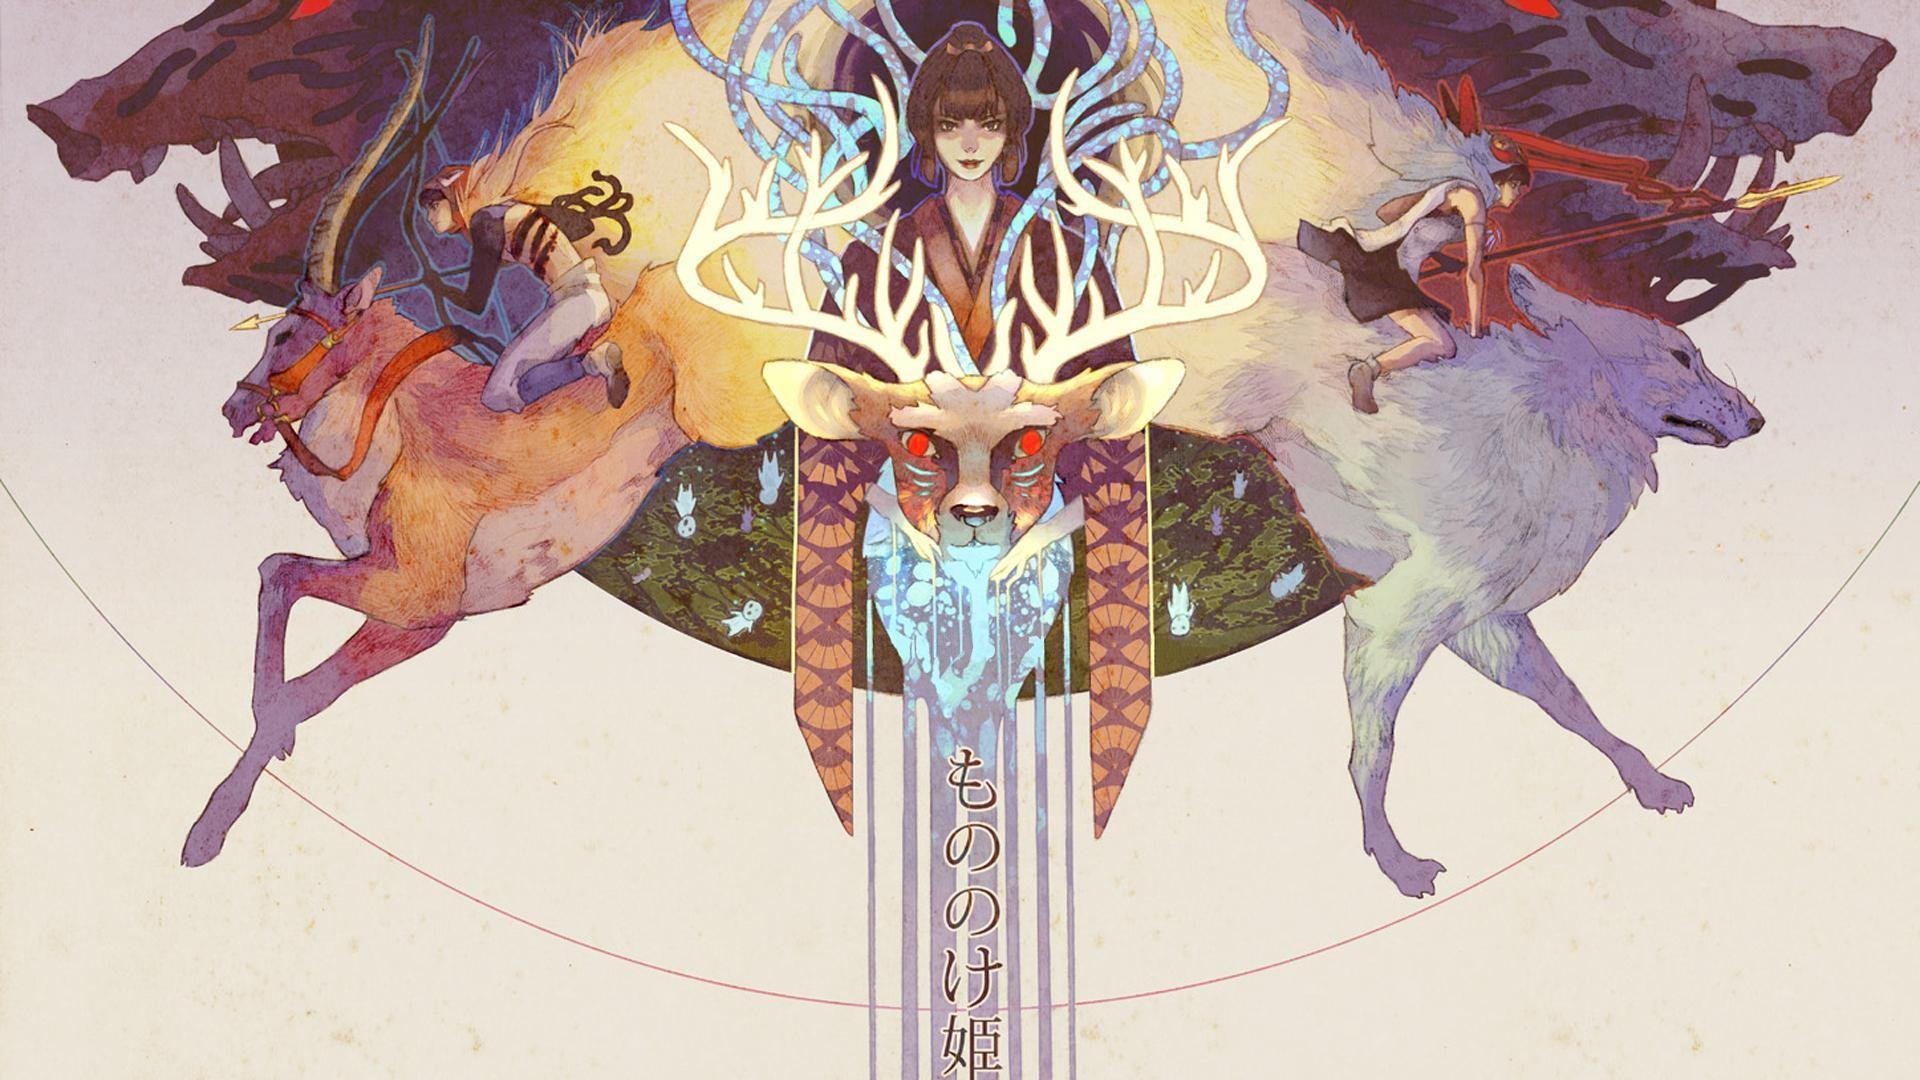 Princess Wallpaper For Girls Princess Mononoke Wallpaper Downloadwallpaper Org